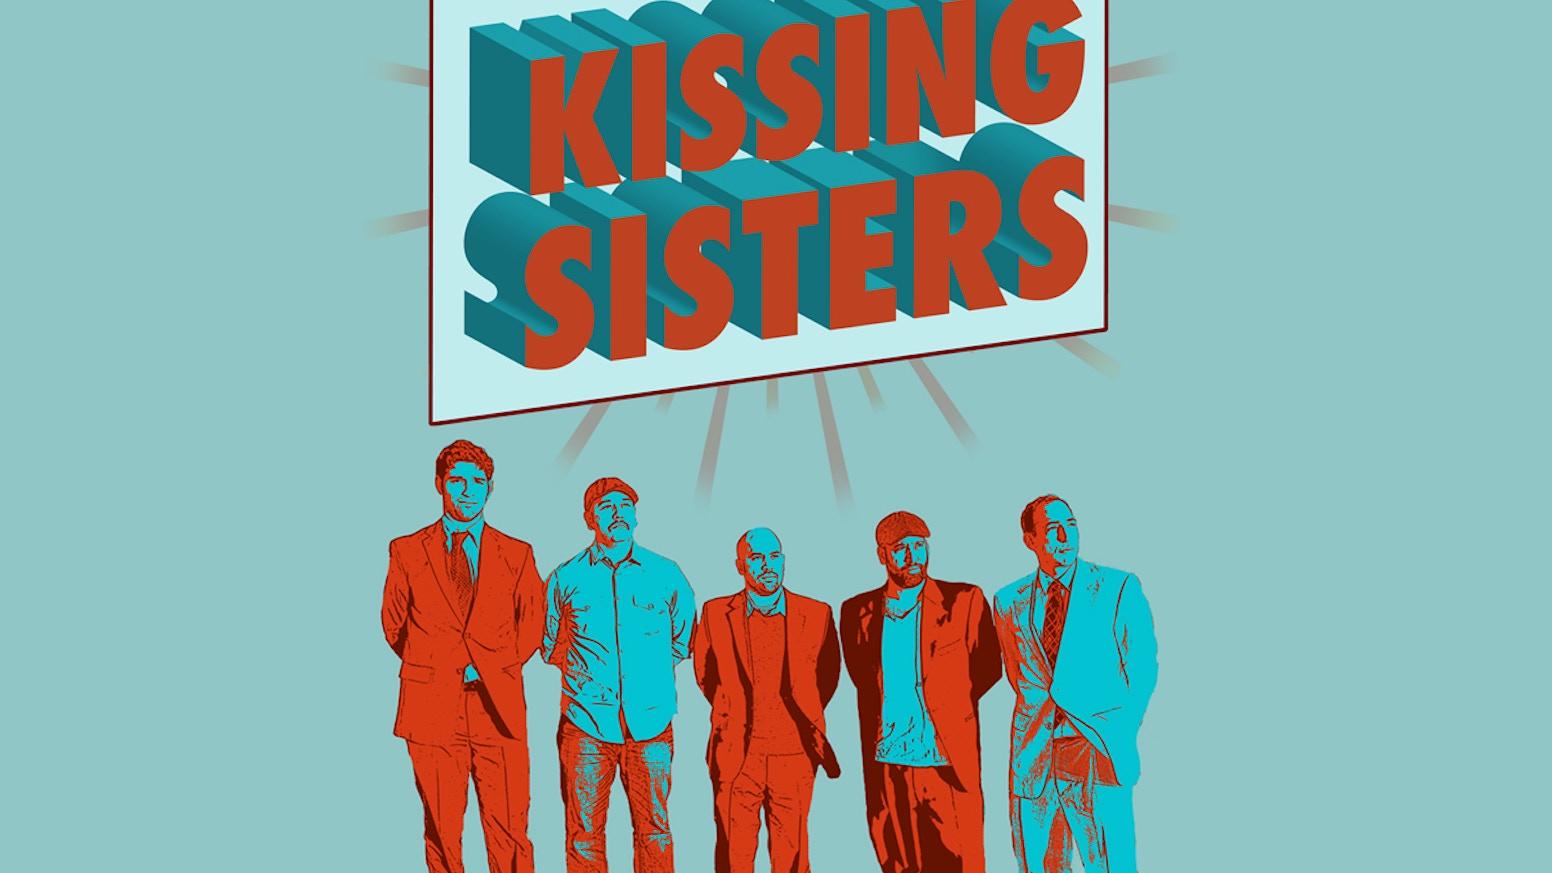 KISSING SISTERS - EPISODE 2 by Kissing Sisters — Kickstarter